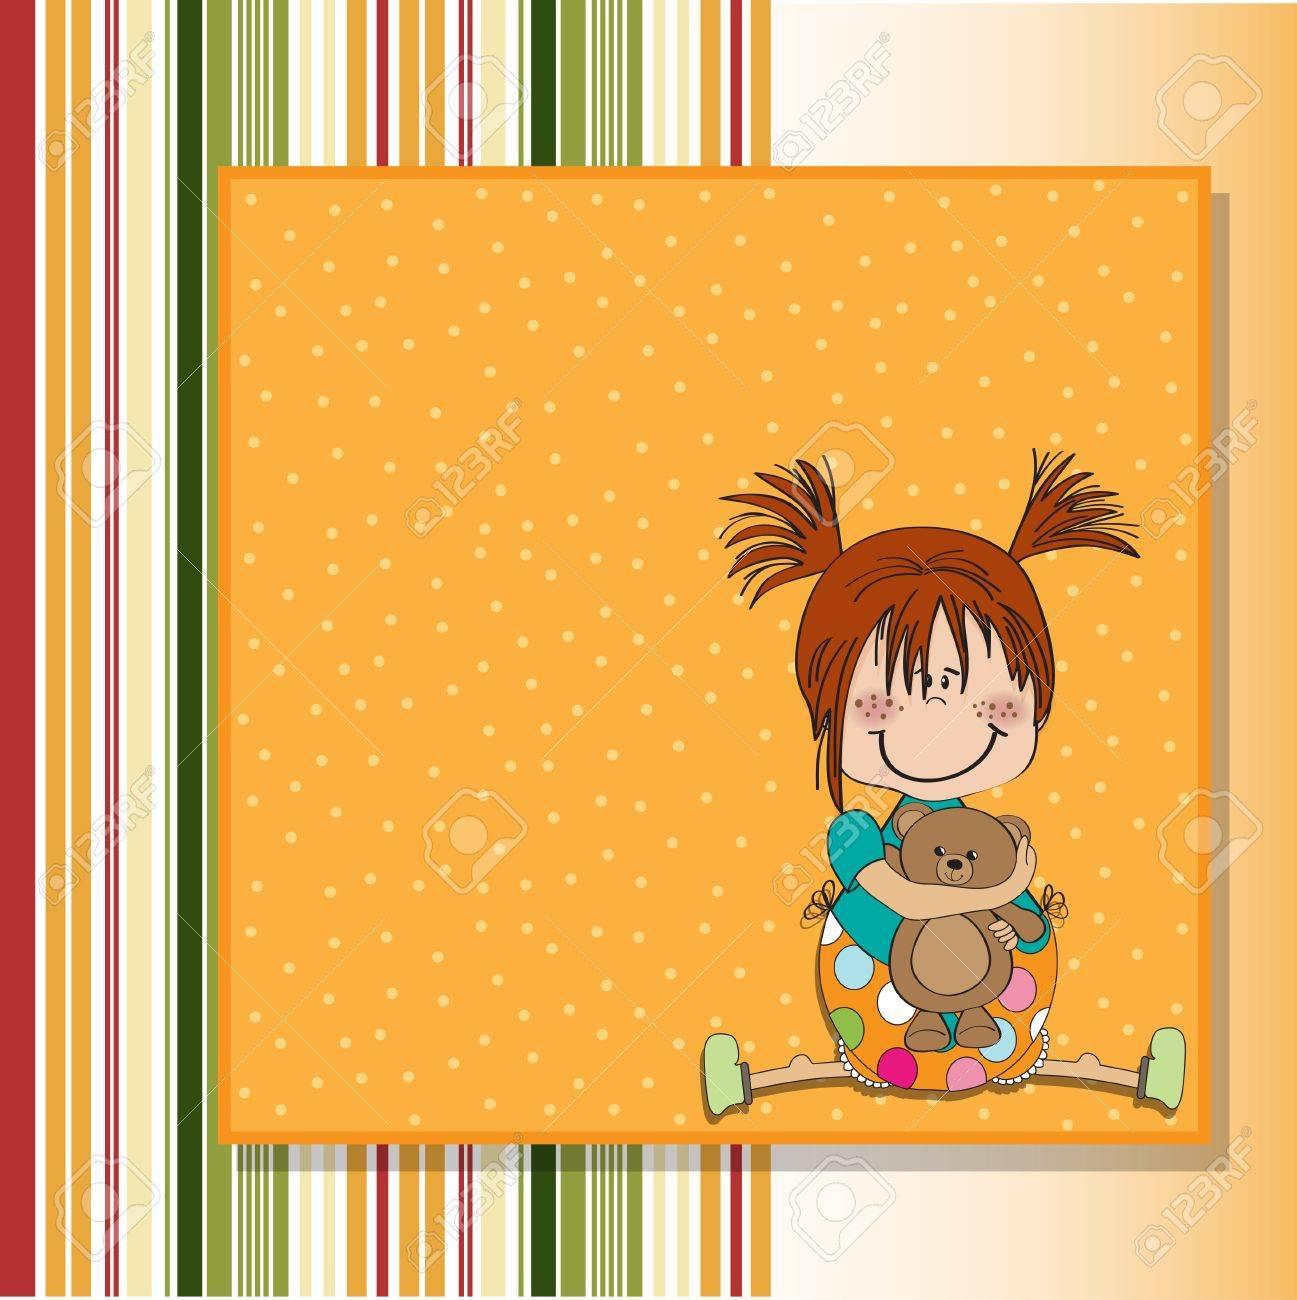 little girl sitting with her teddy bear Stock Vector - 14491246